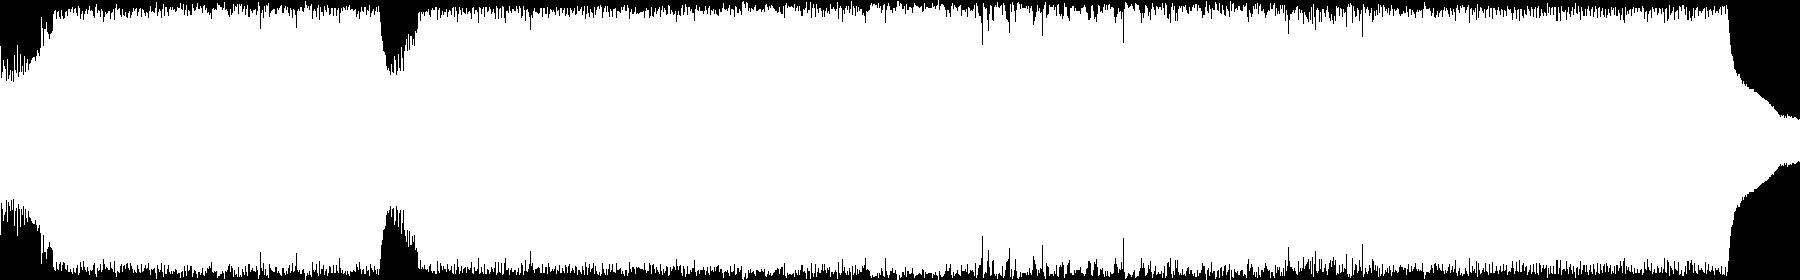 Psy Trance Energy audio waveform